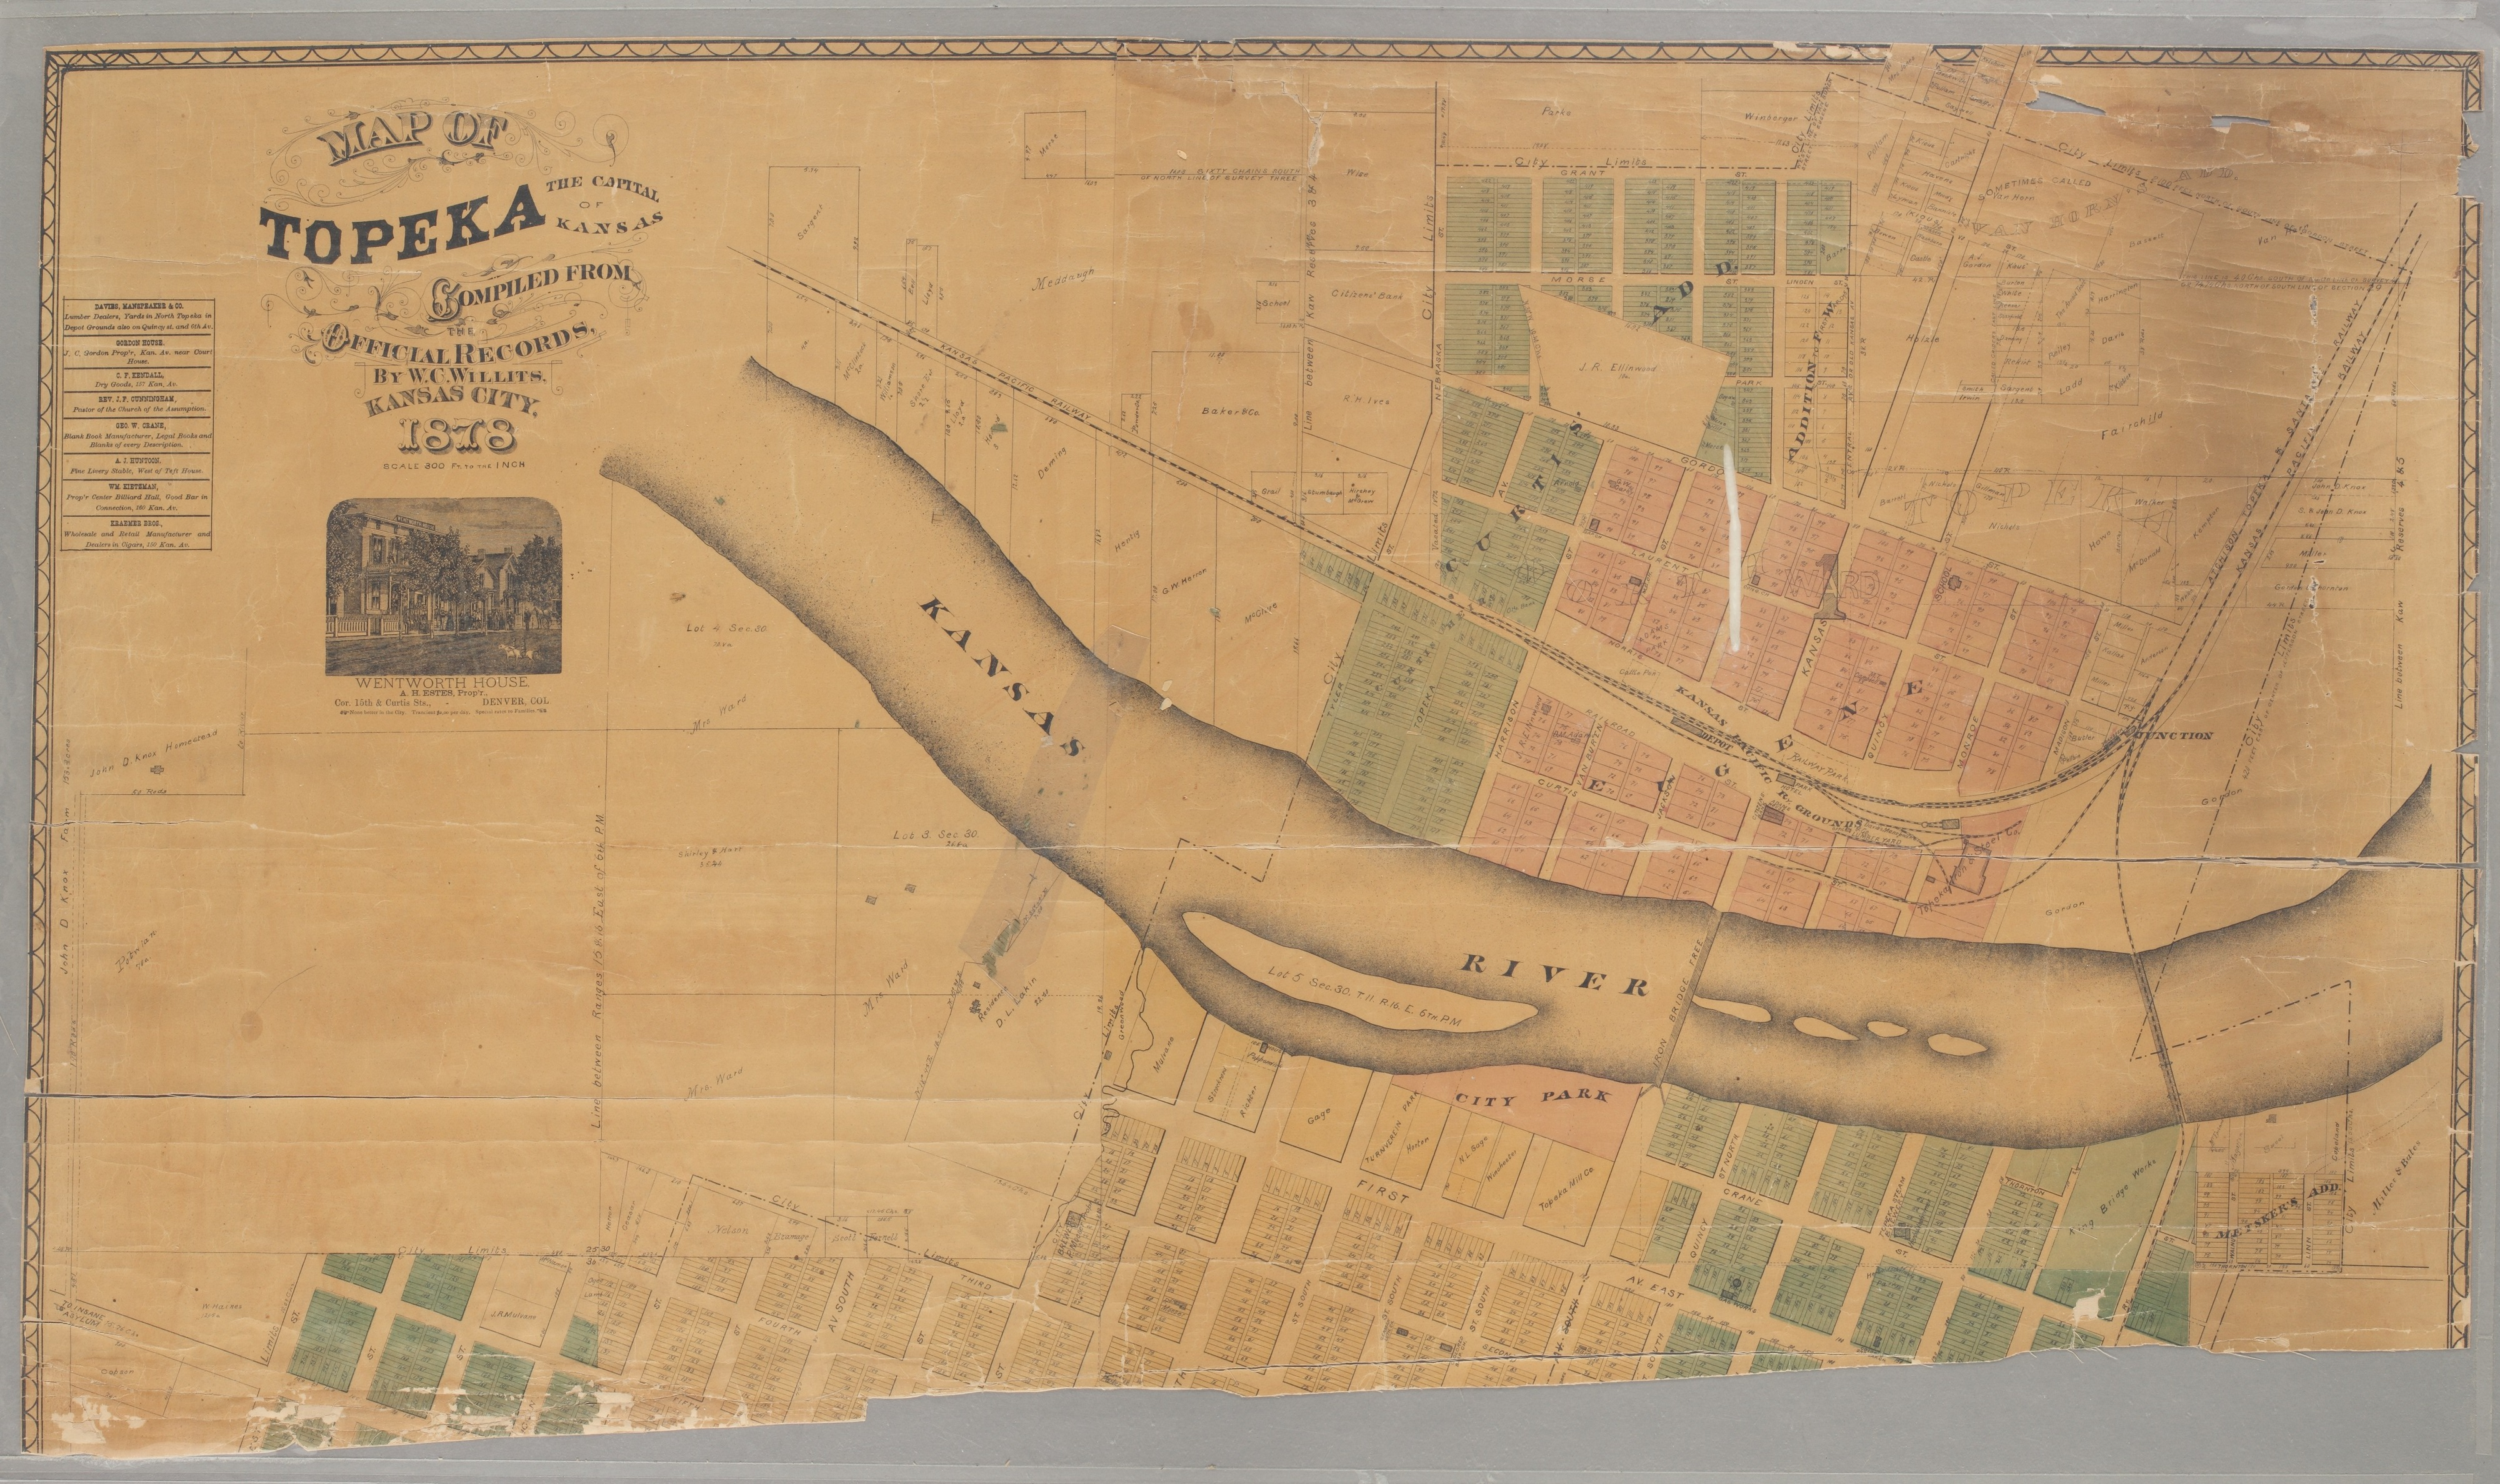 Map of Topeka. The capital of Kansas - 1